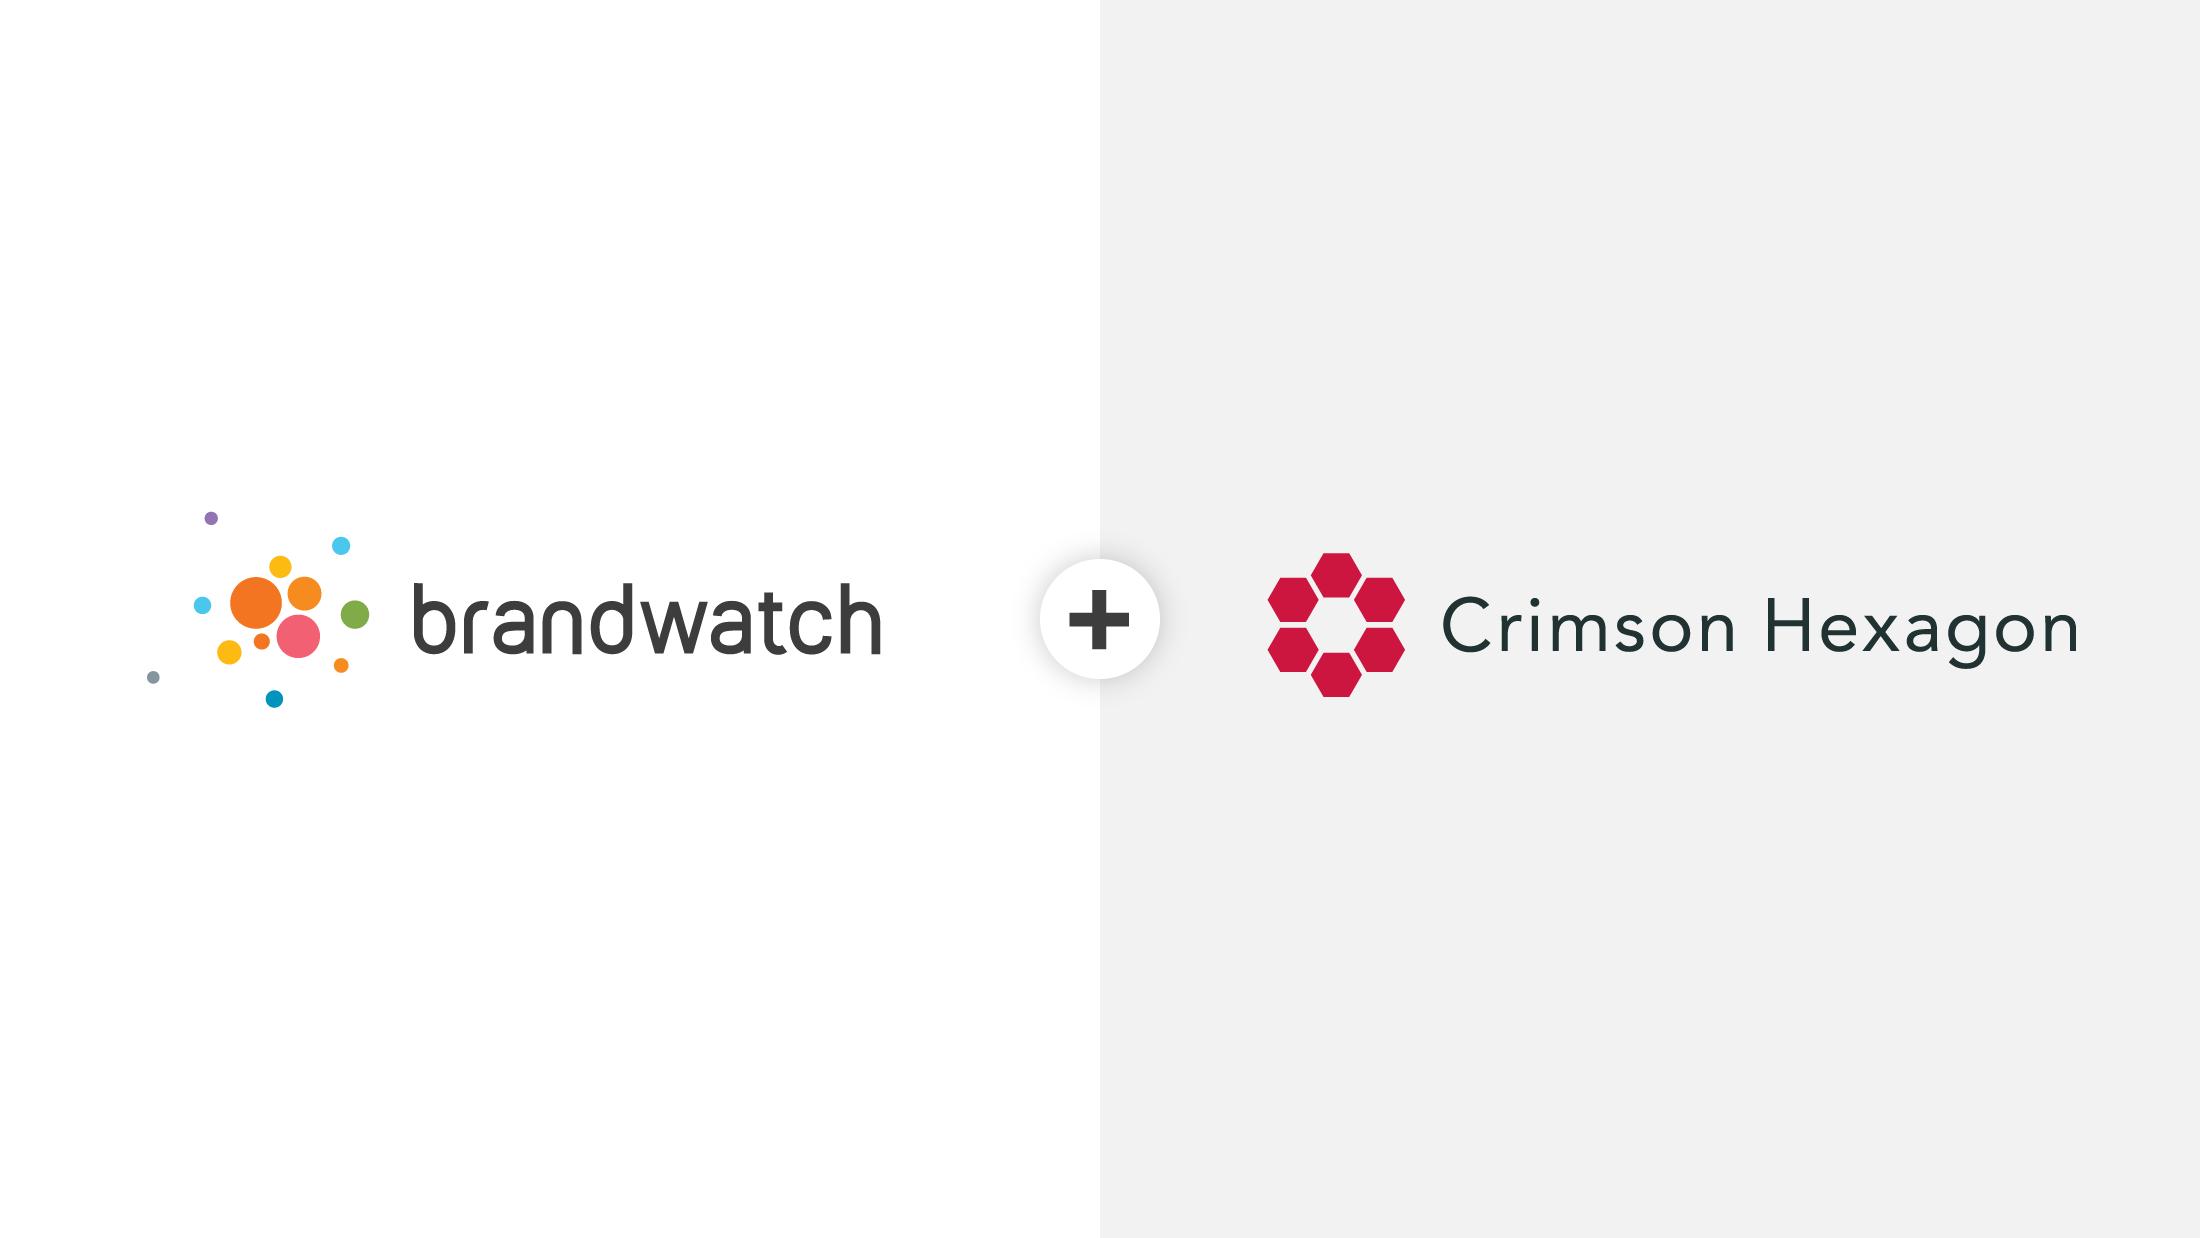 Brandwatch and Crimson Hexagon to merge into $100M social.